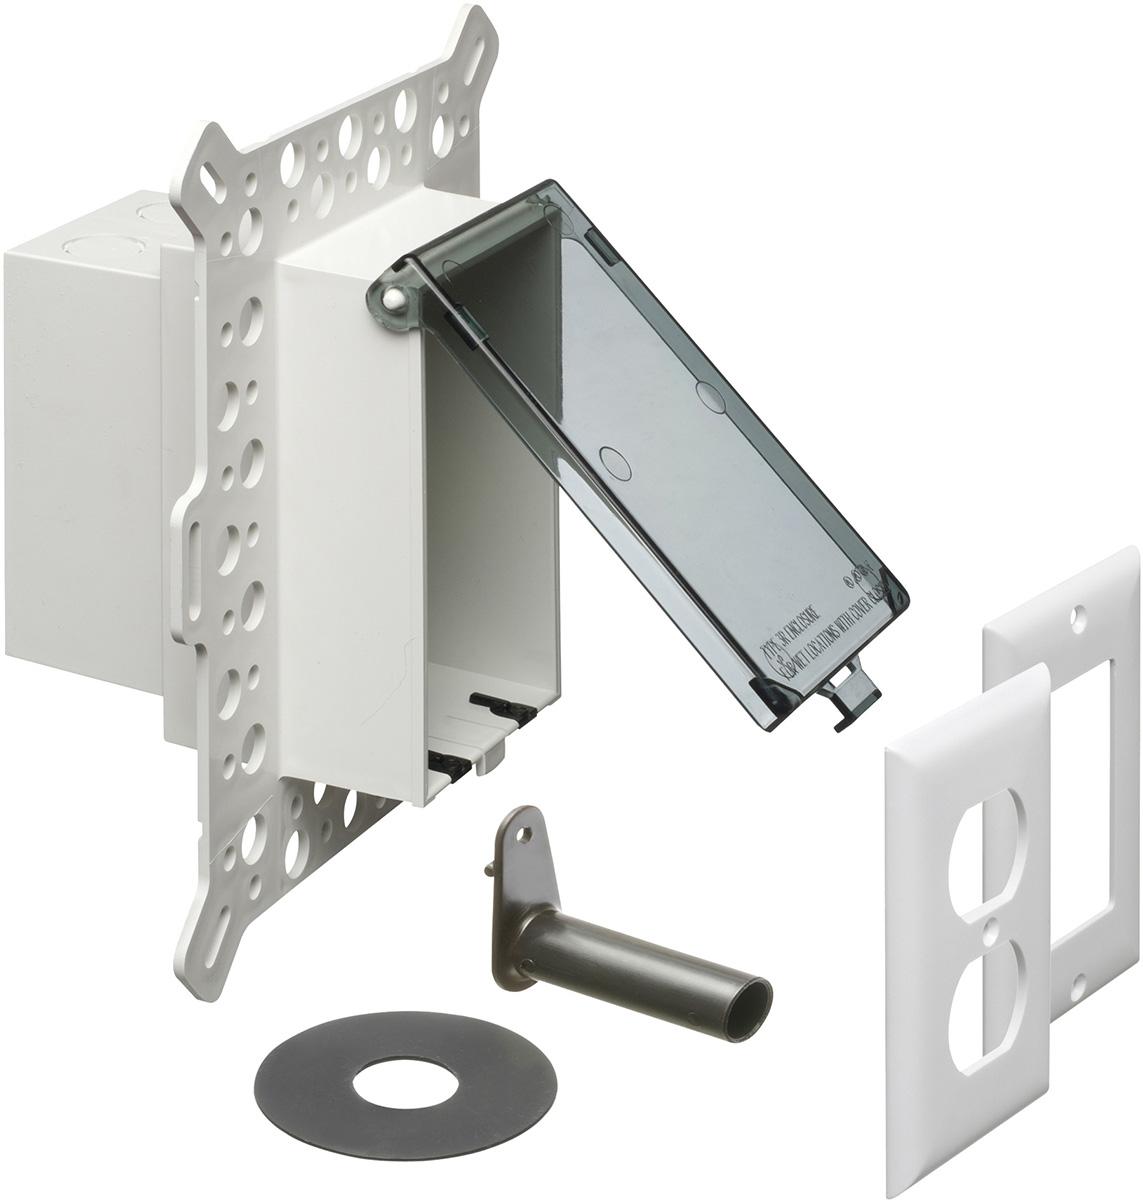 Electrical Weatherproof Lock Box: Arlington DBVM1C-1 Electrical Box With Weatherproof Cover